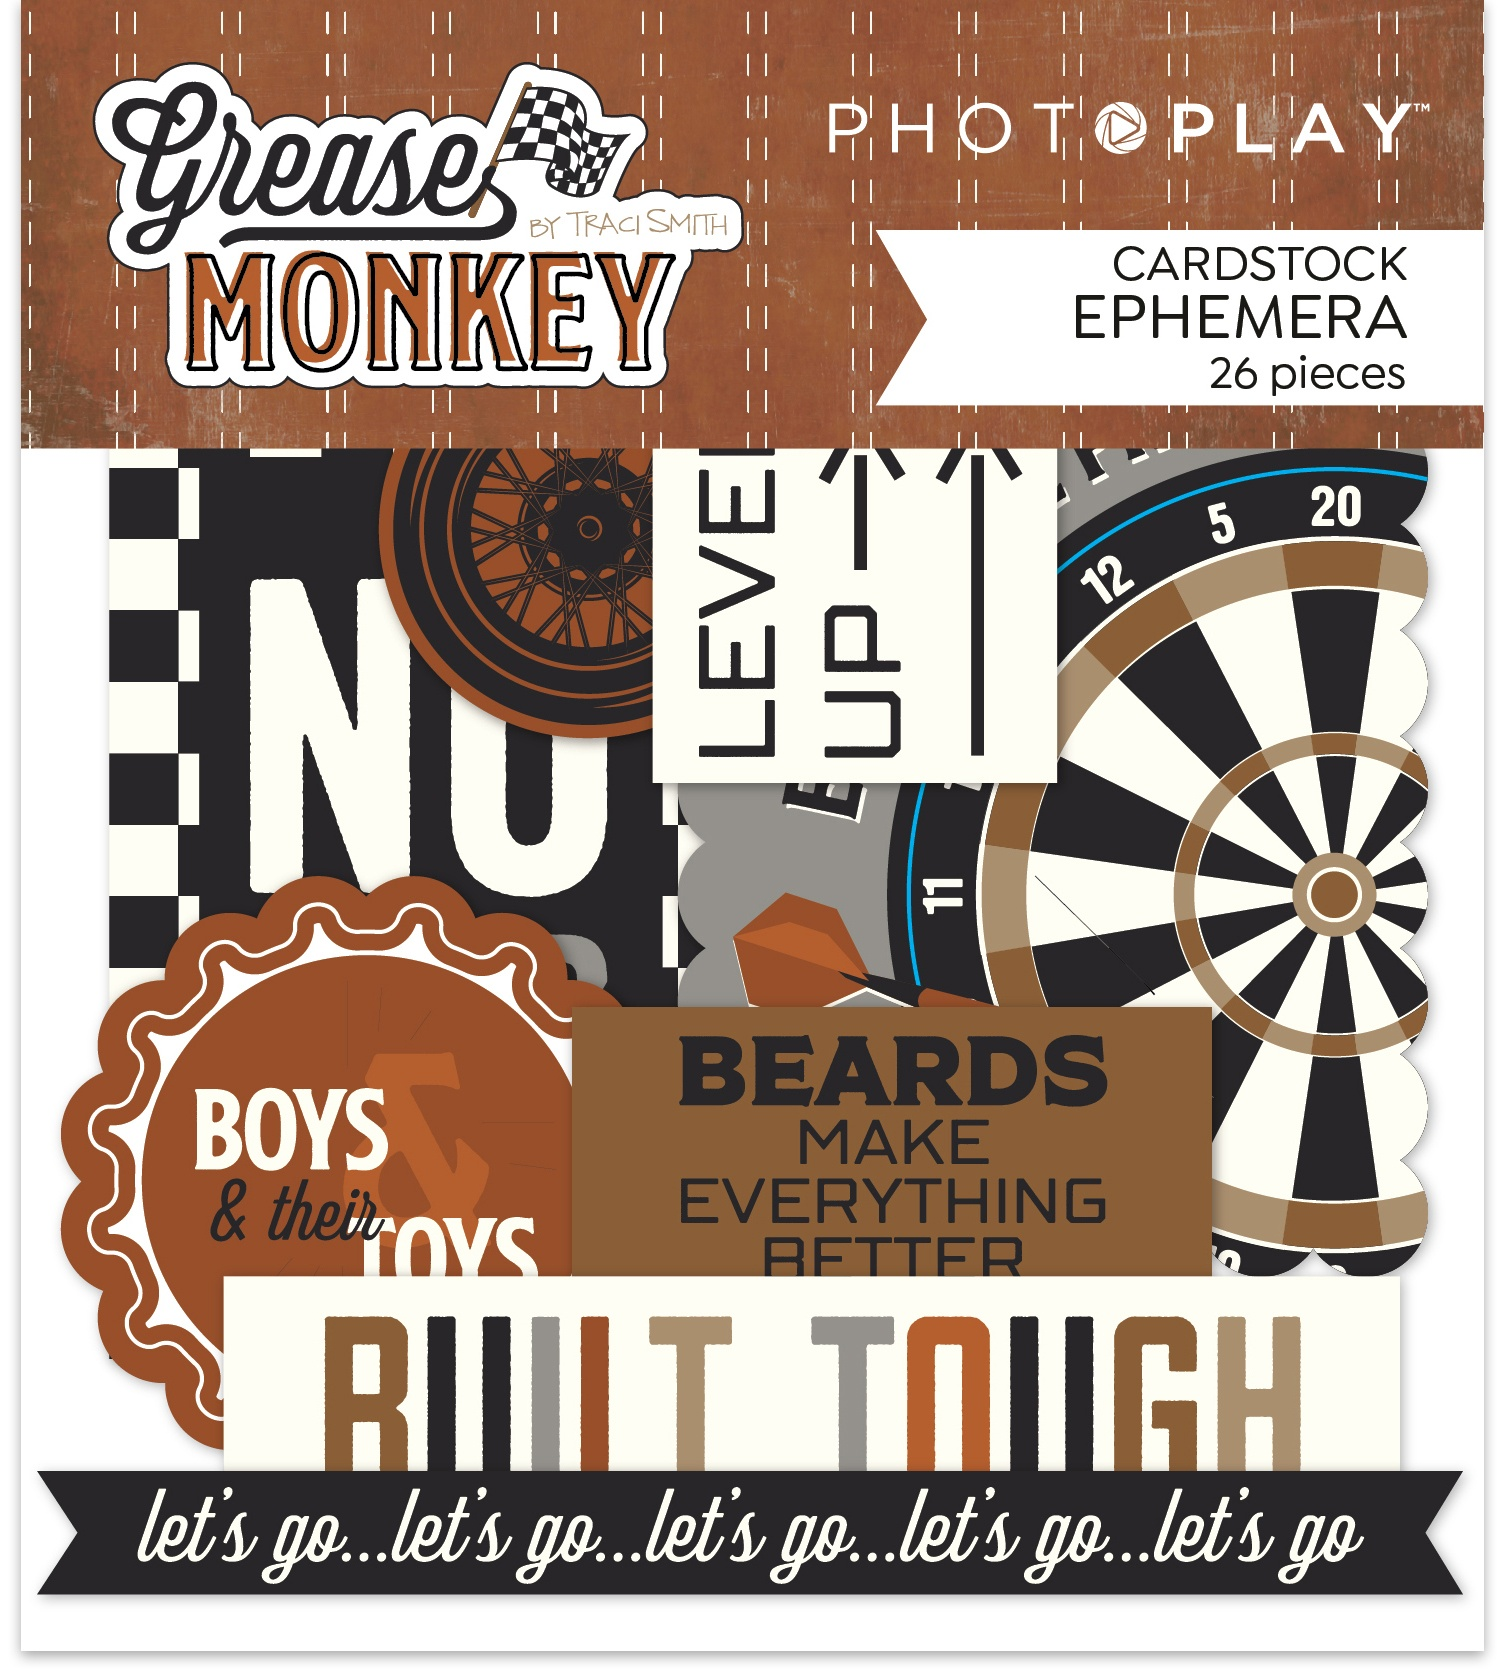 PhotoPlay - Grease Monkey  - Cardstock Ephemera